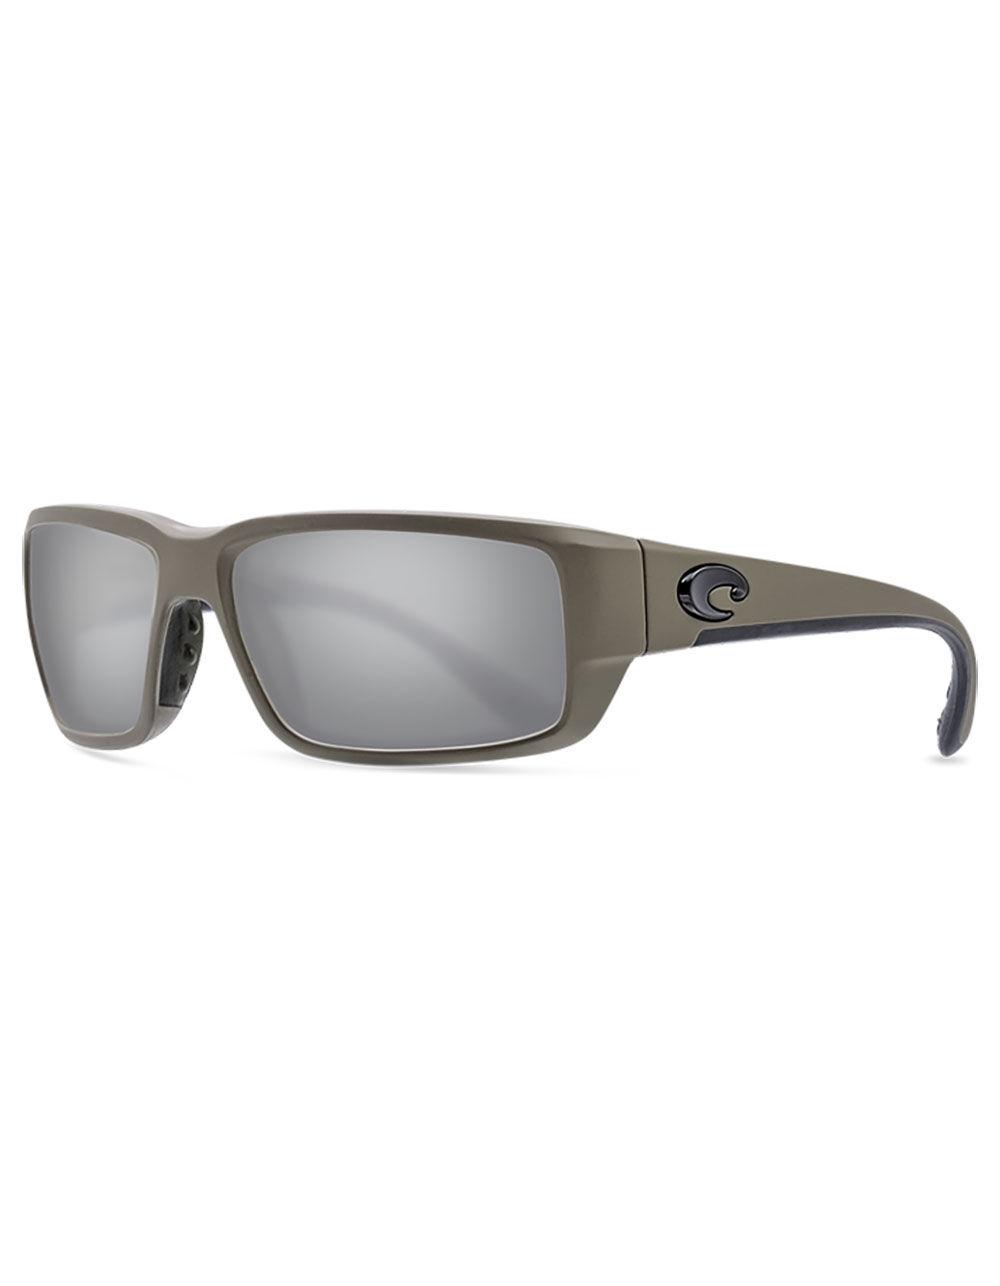 COSTA Fantail Matte Moss Polarized Sunglasses